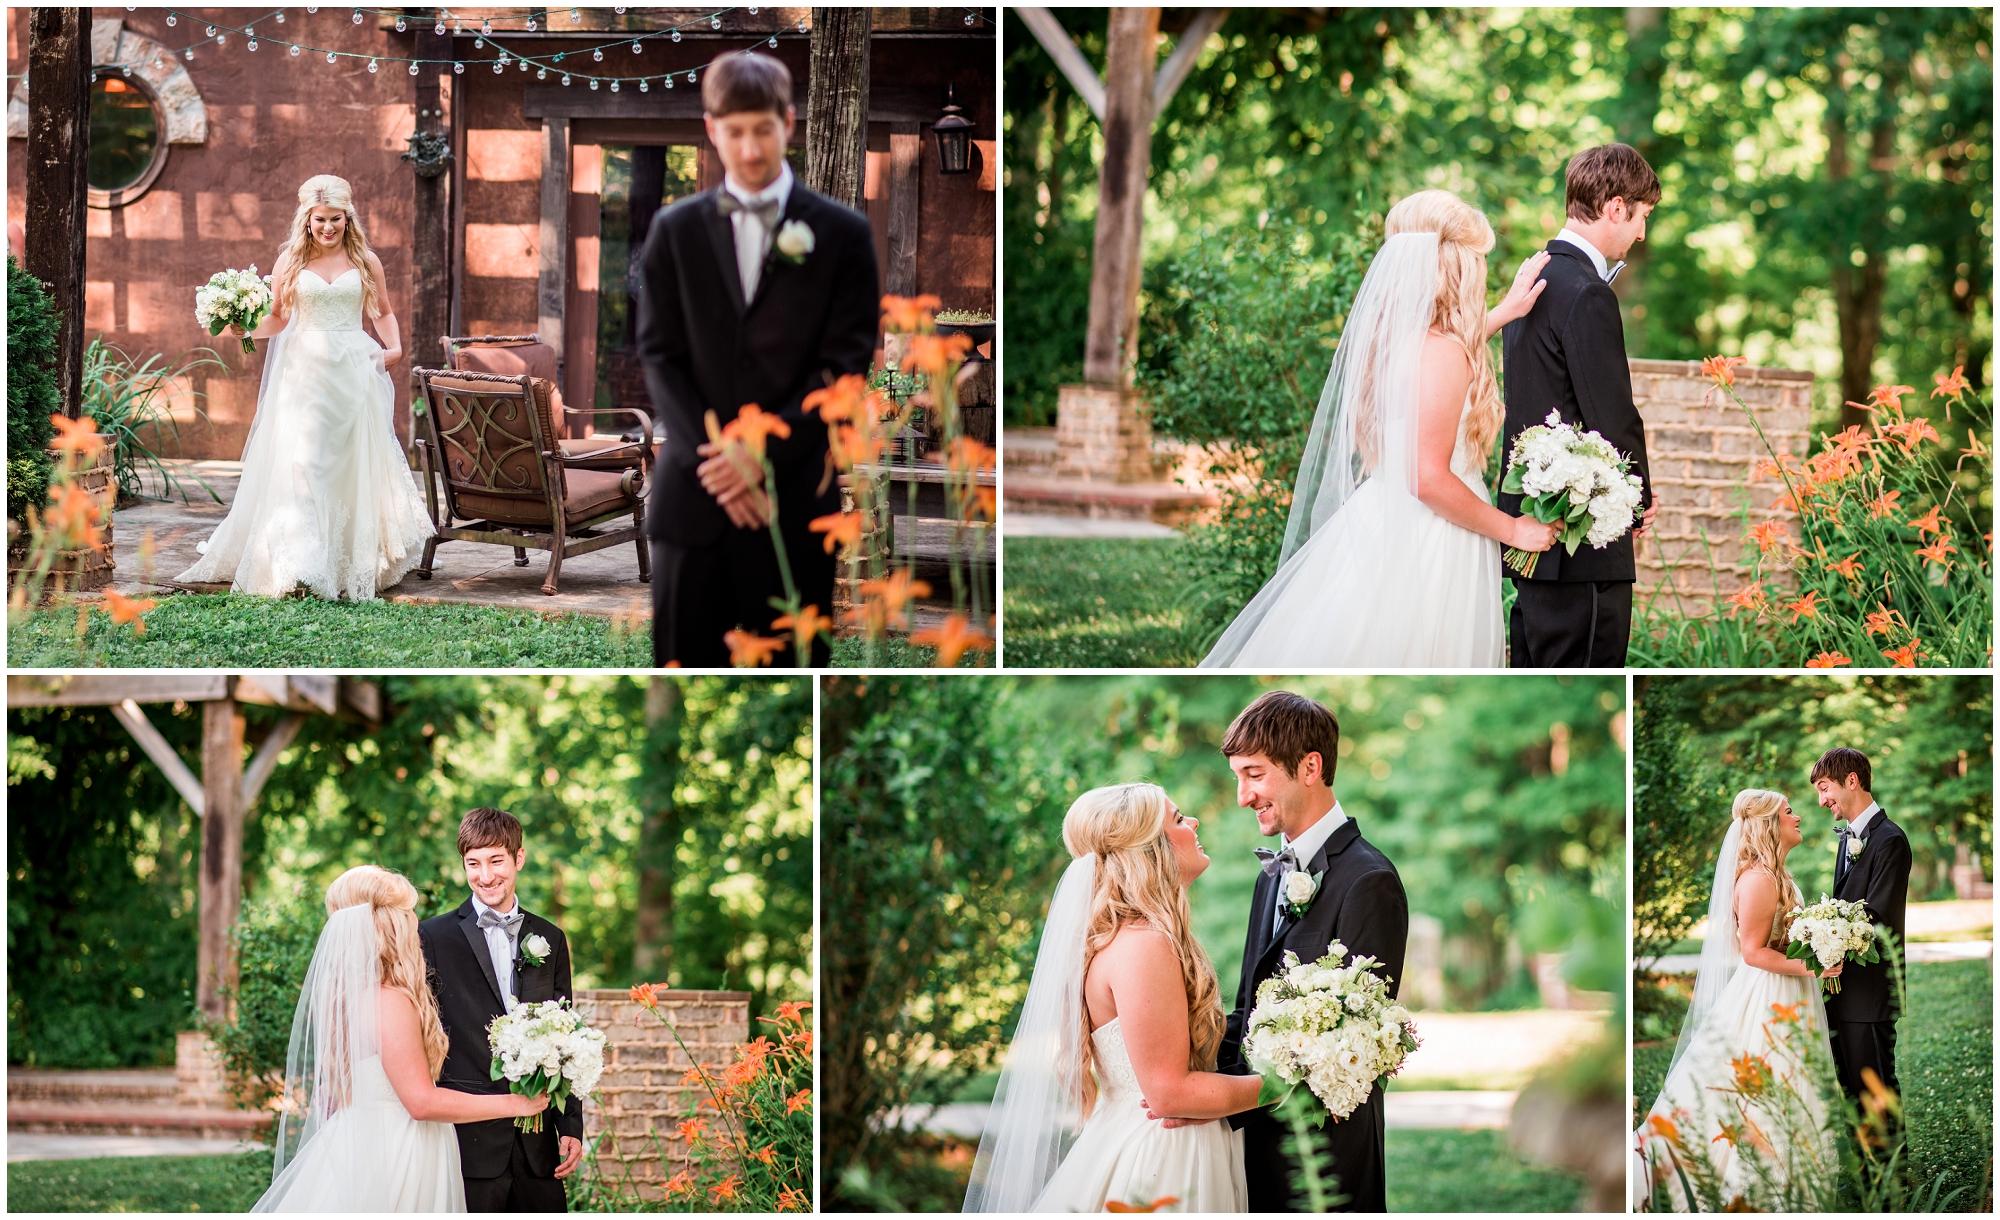 destyn_josh_casons_cove_wedding-0785.jpg